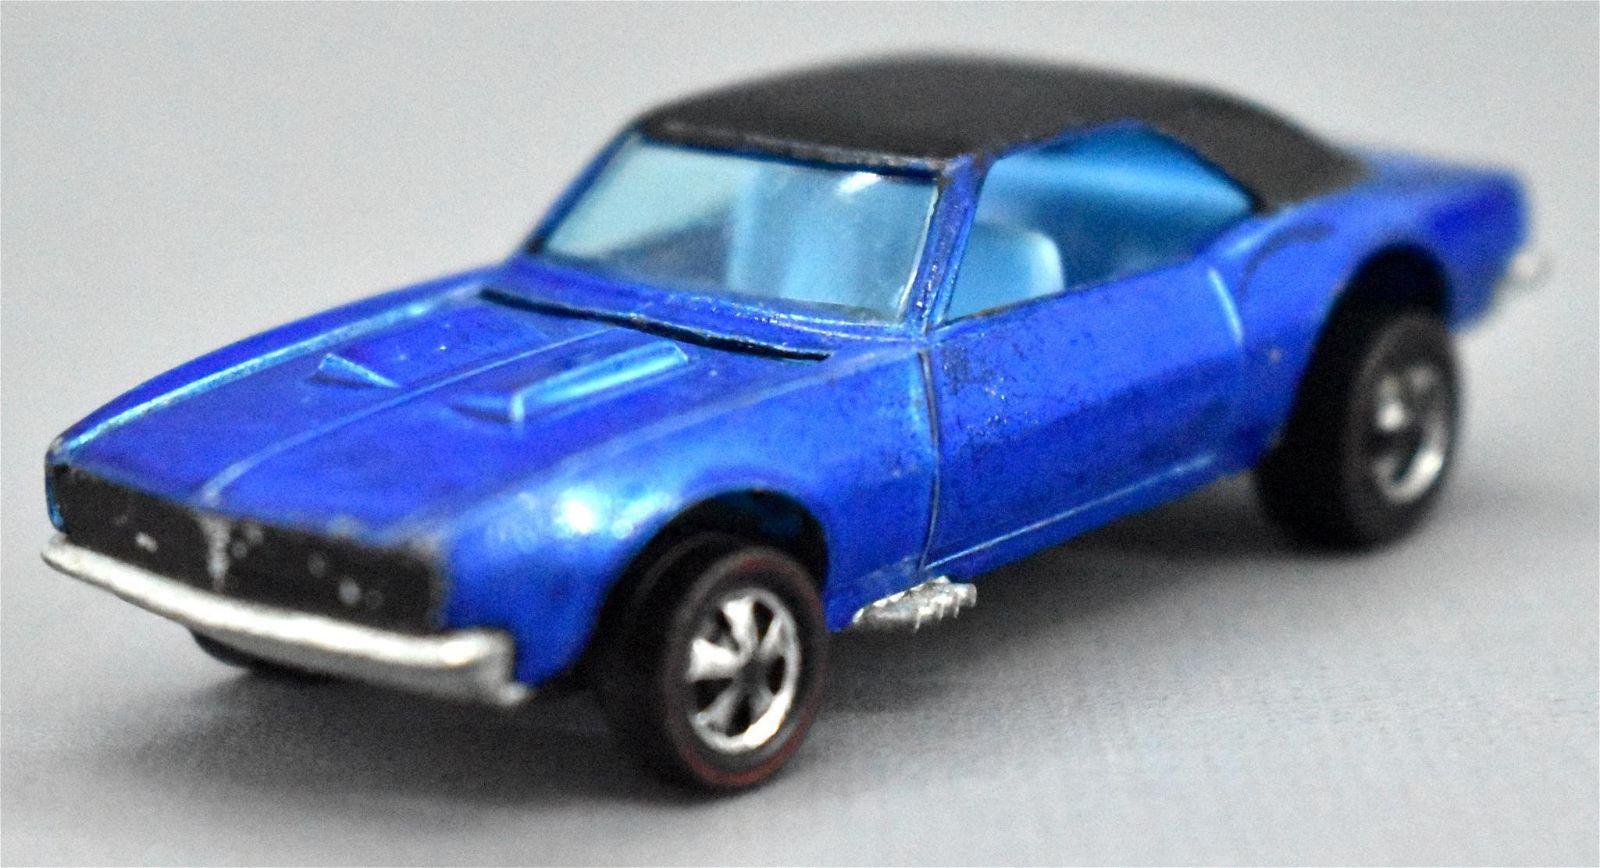 Redline Hot Wheels blue HK Custom Camaro with blue